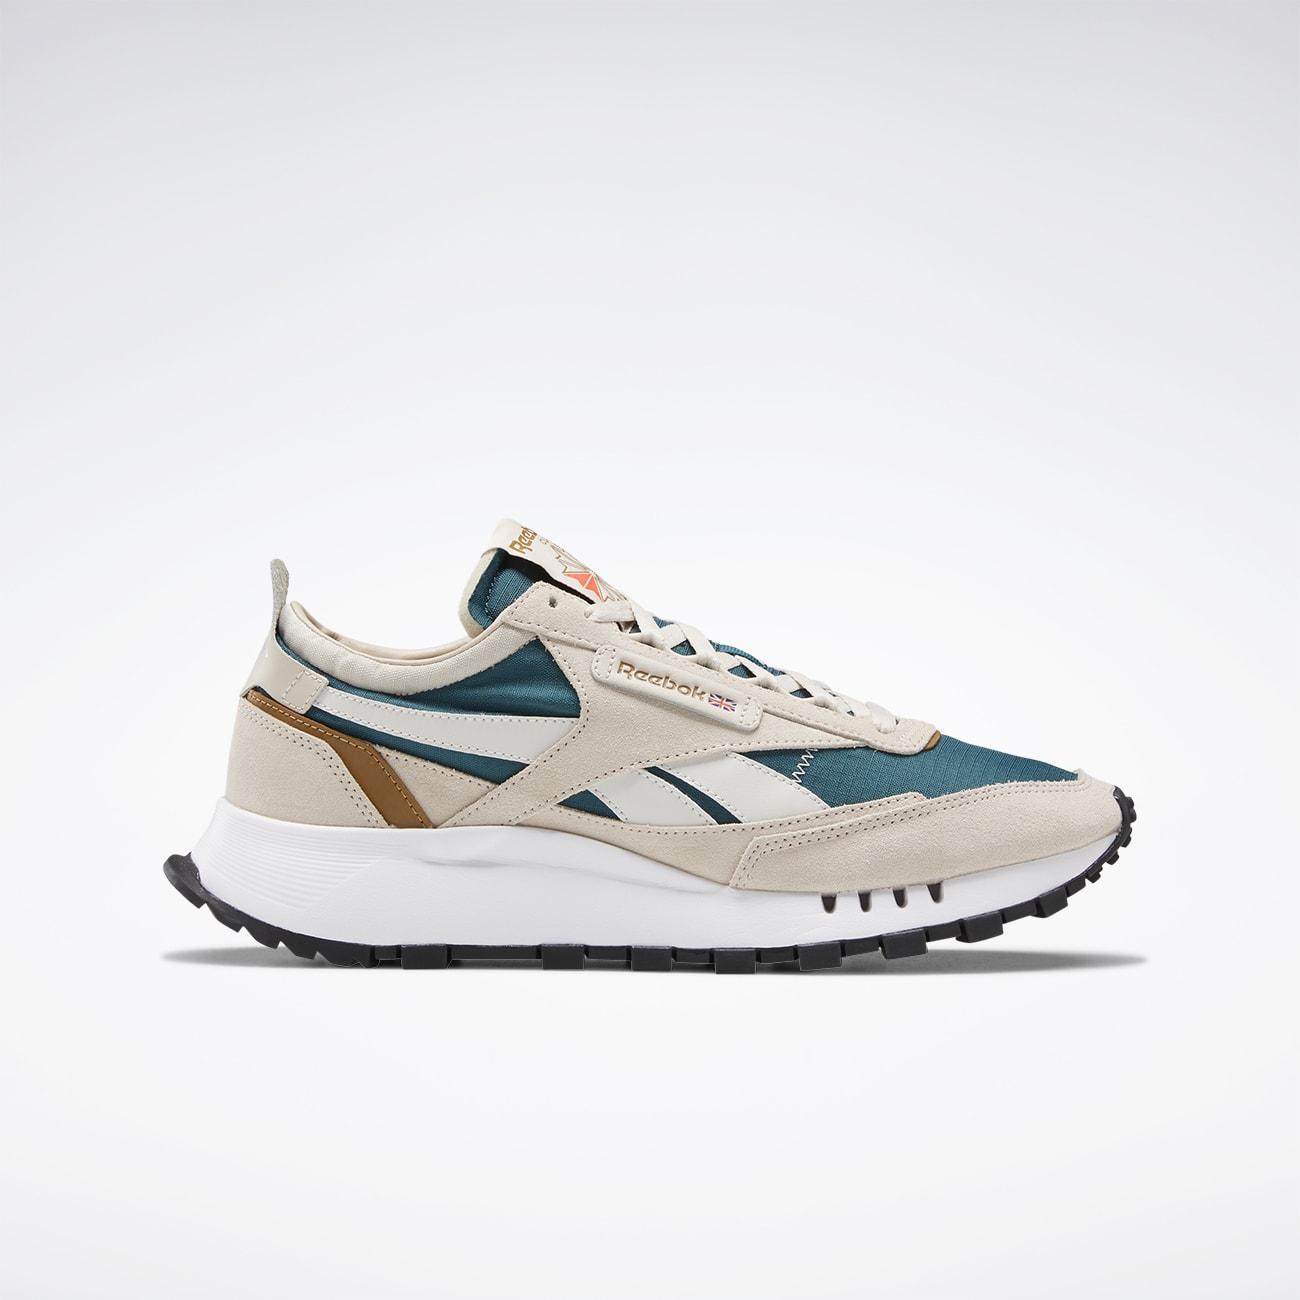 RetroSneaker2